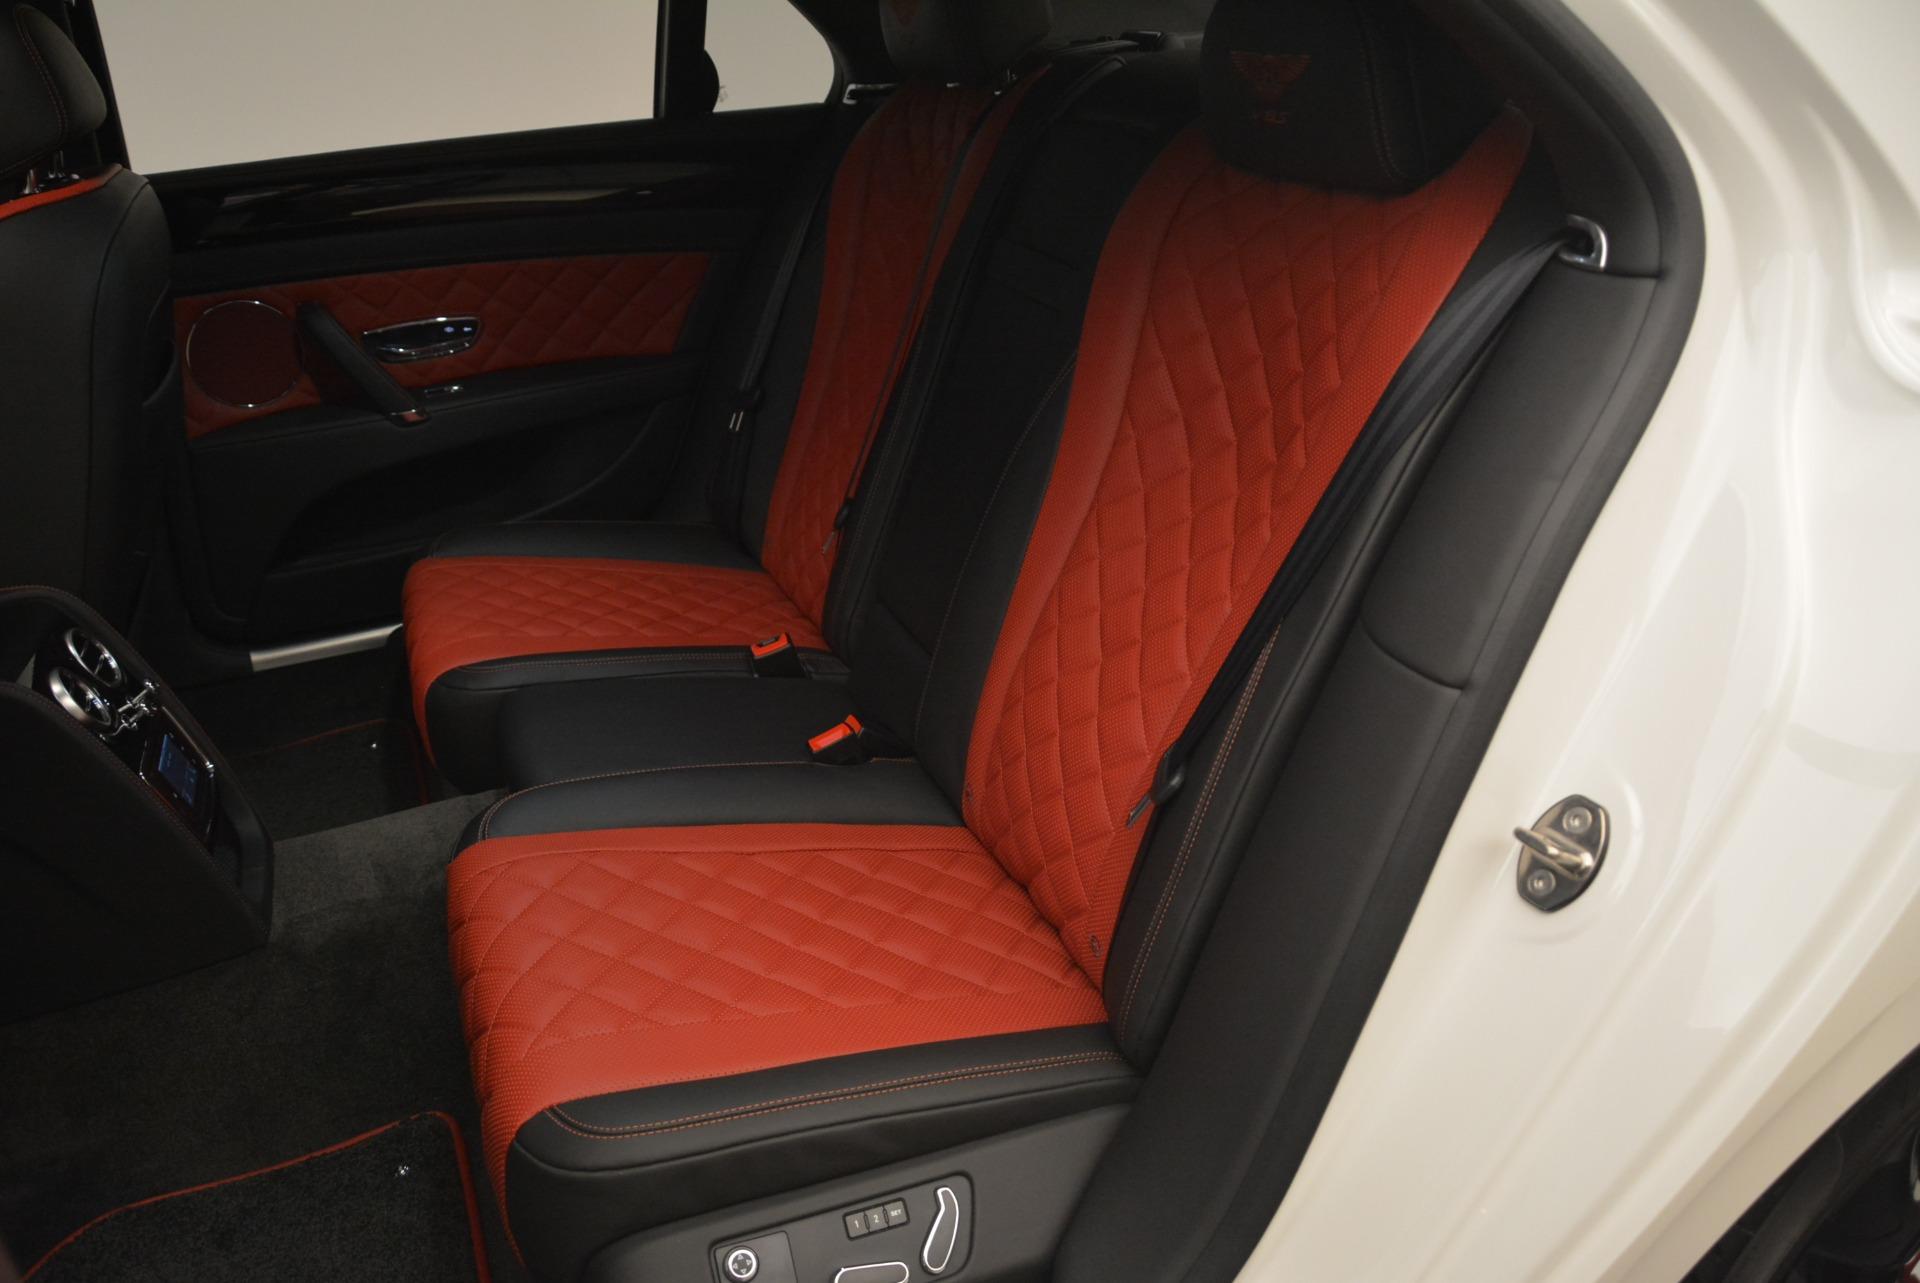 New 2018 Bentley Flying Spur V8 S Black Edition For Sale In Westport, CT 2096_p23